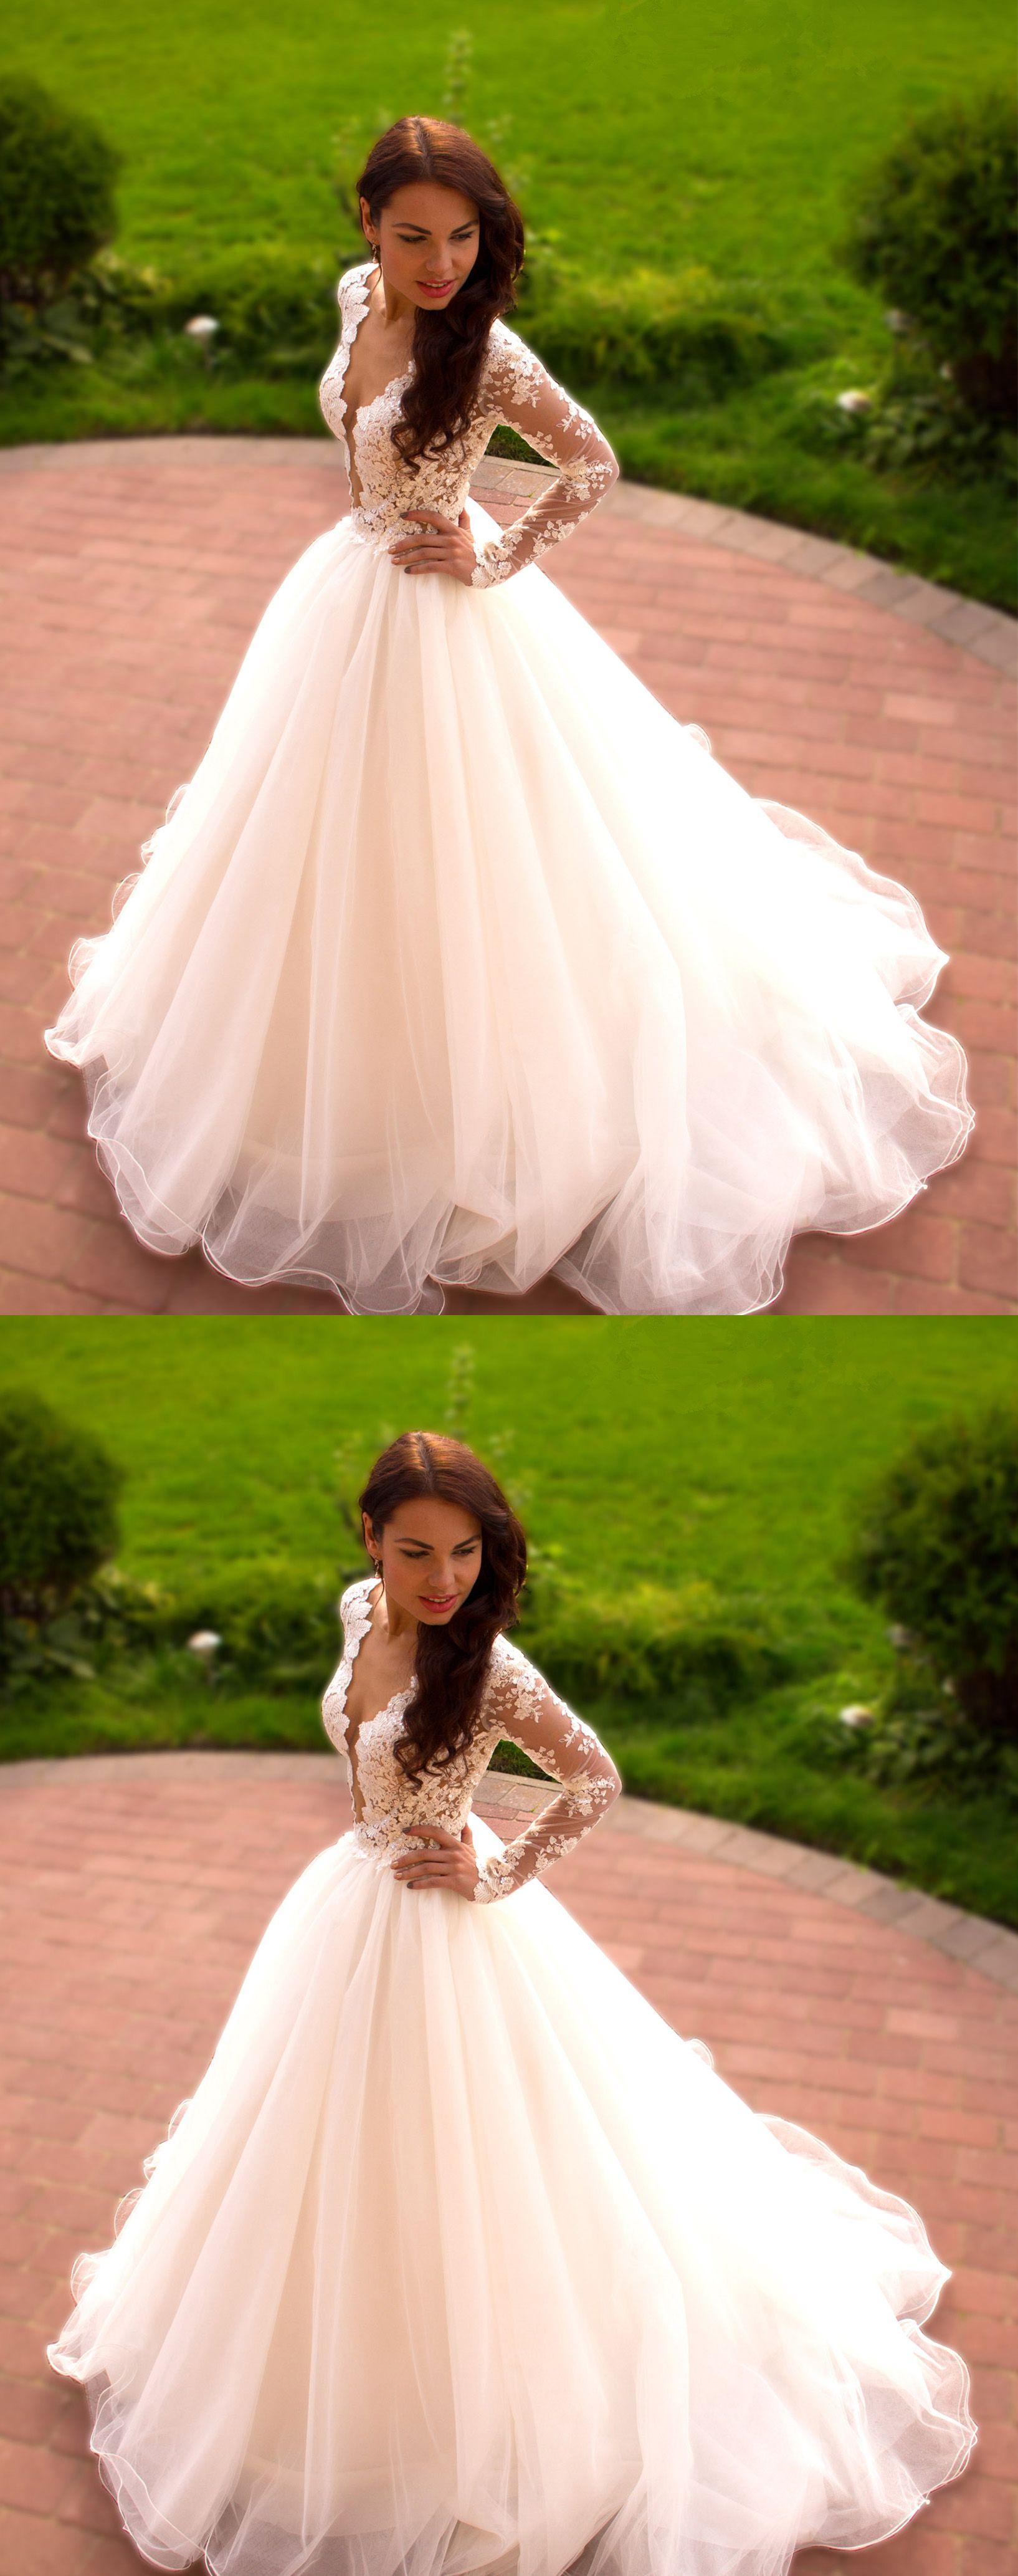 Romantic wedding dressaline wedding dressvneck wedding dress